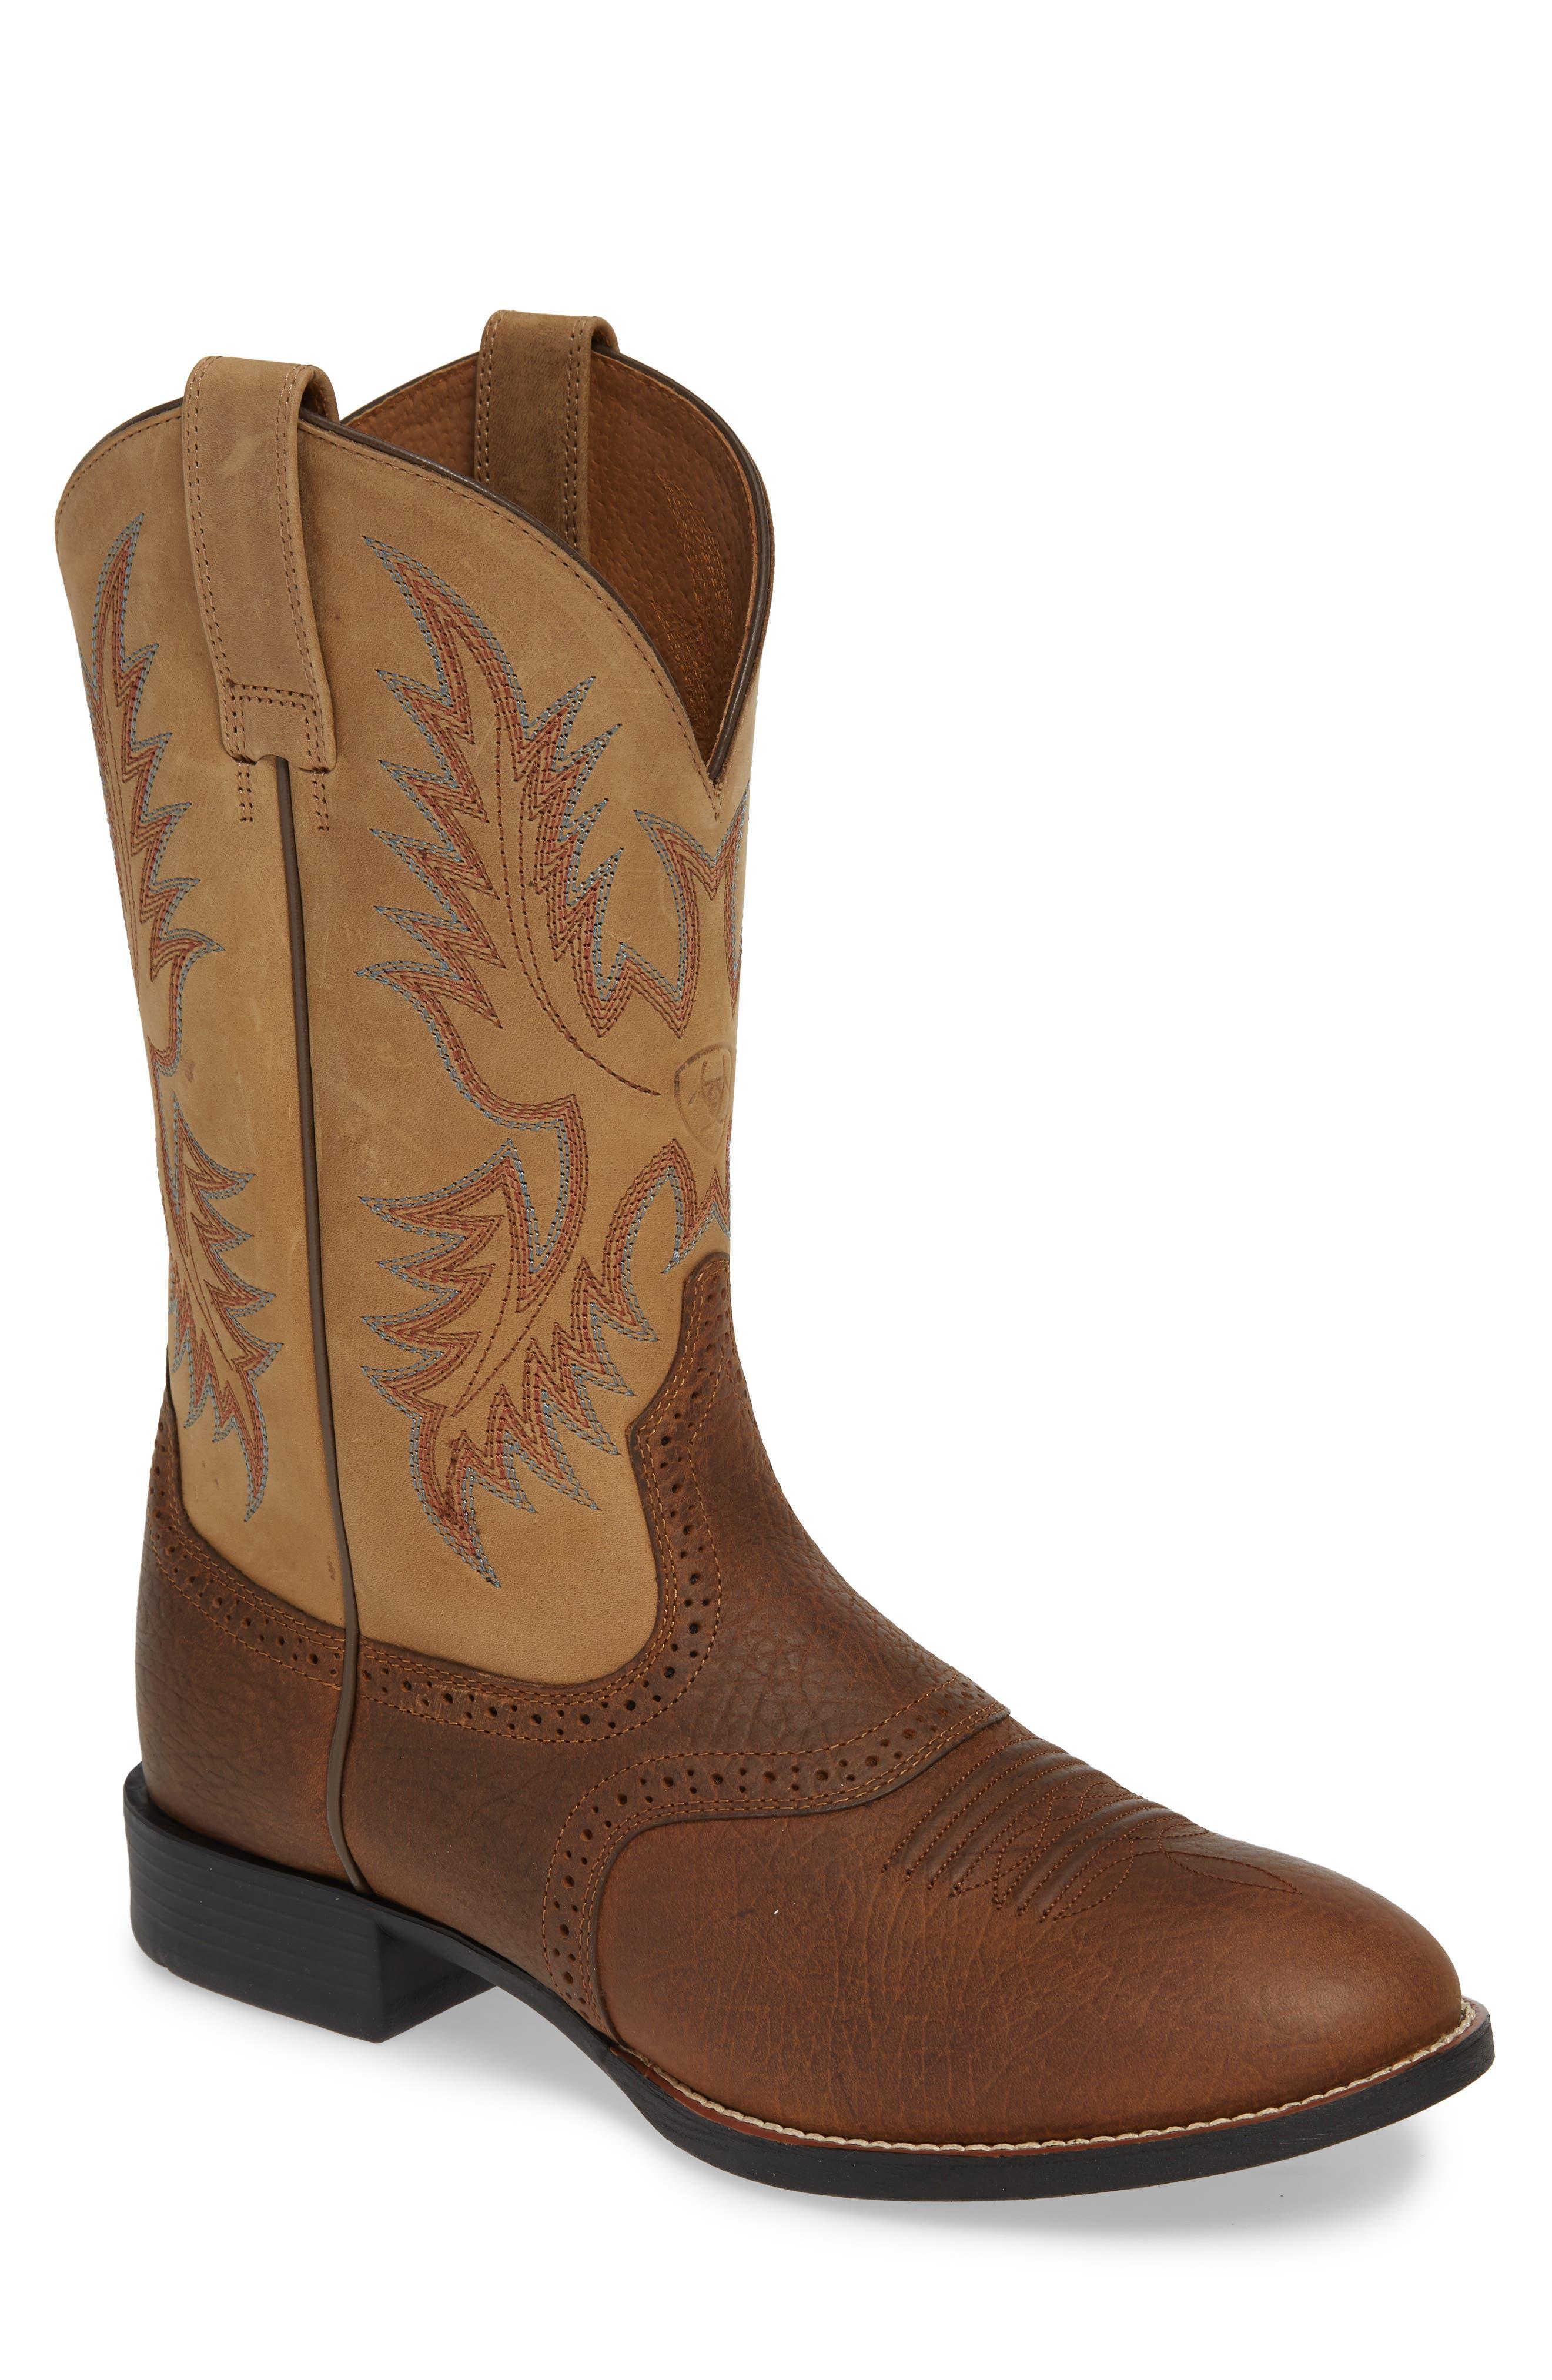 Ariat Heritage Stockman Cowboy Boot, Brown